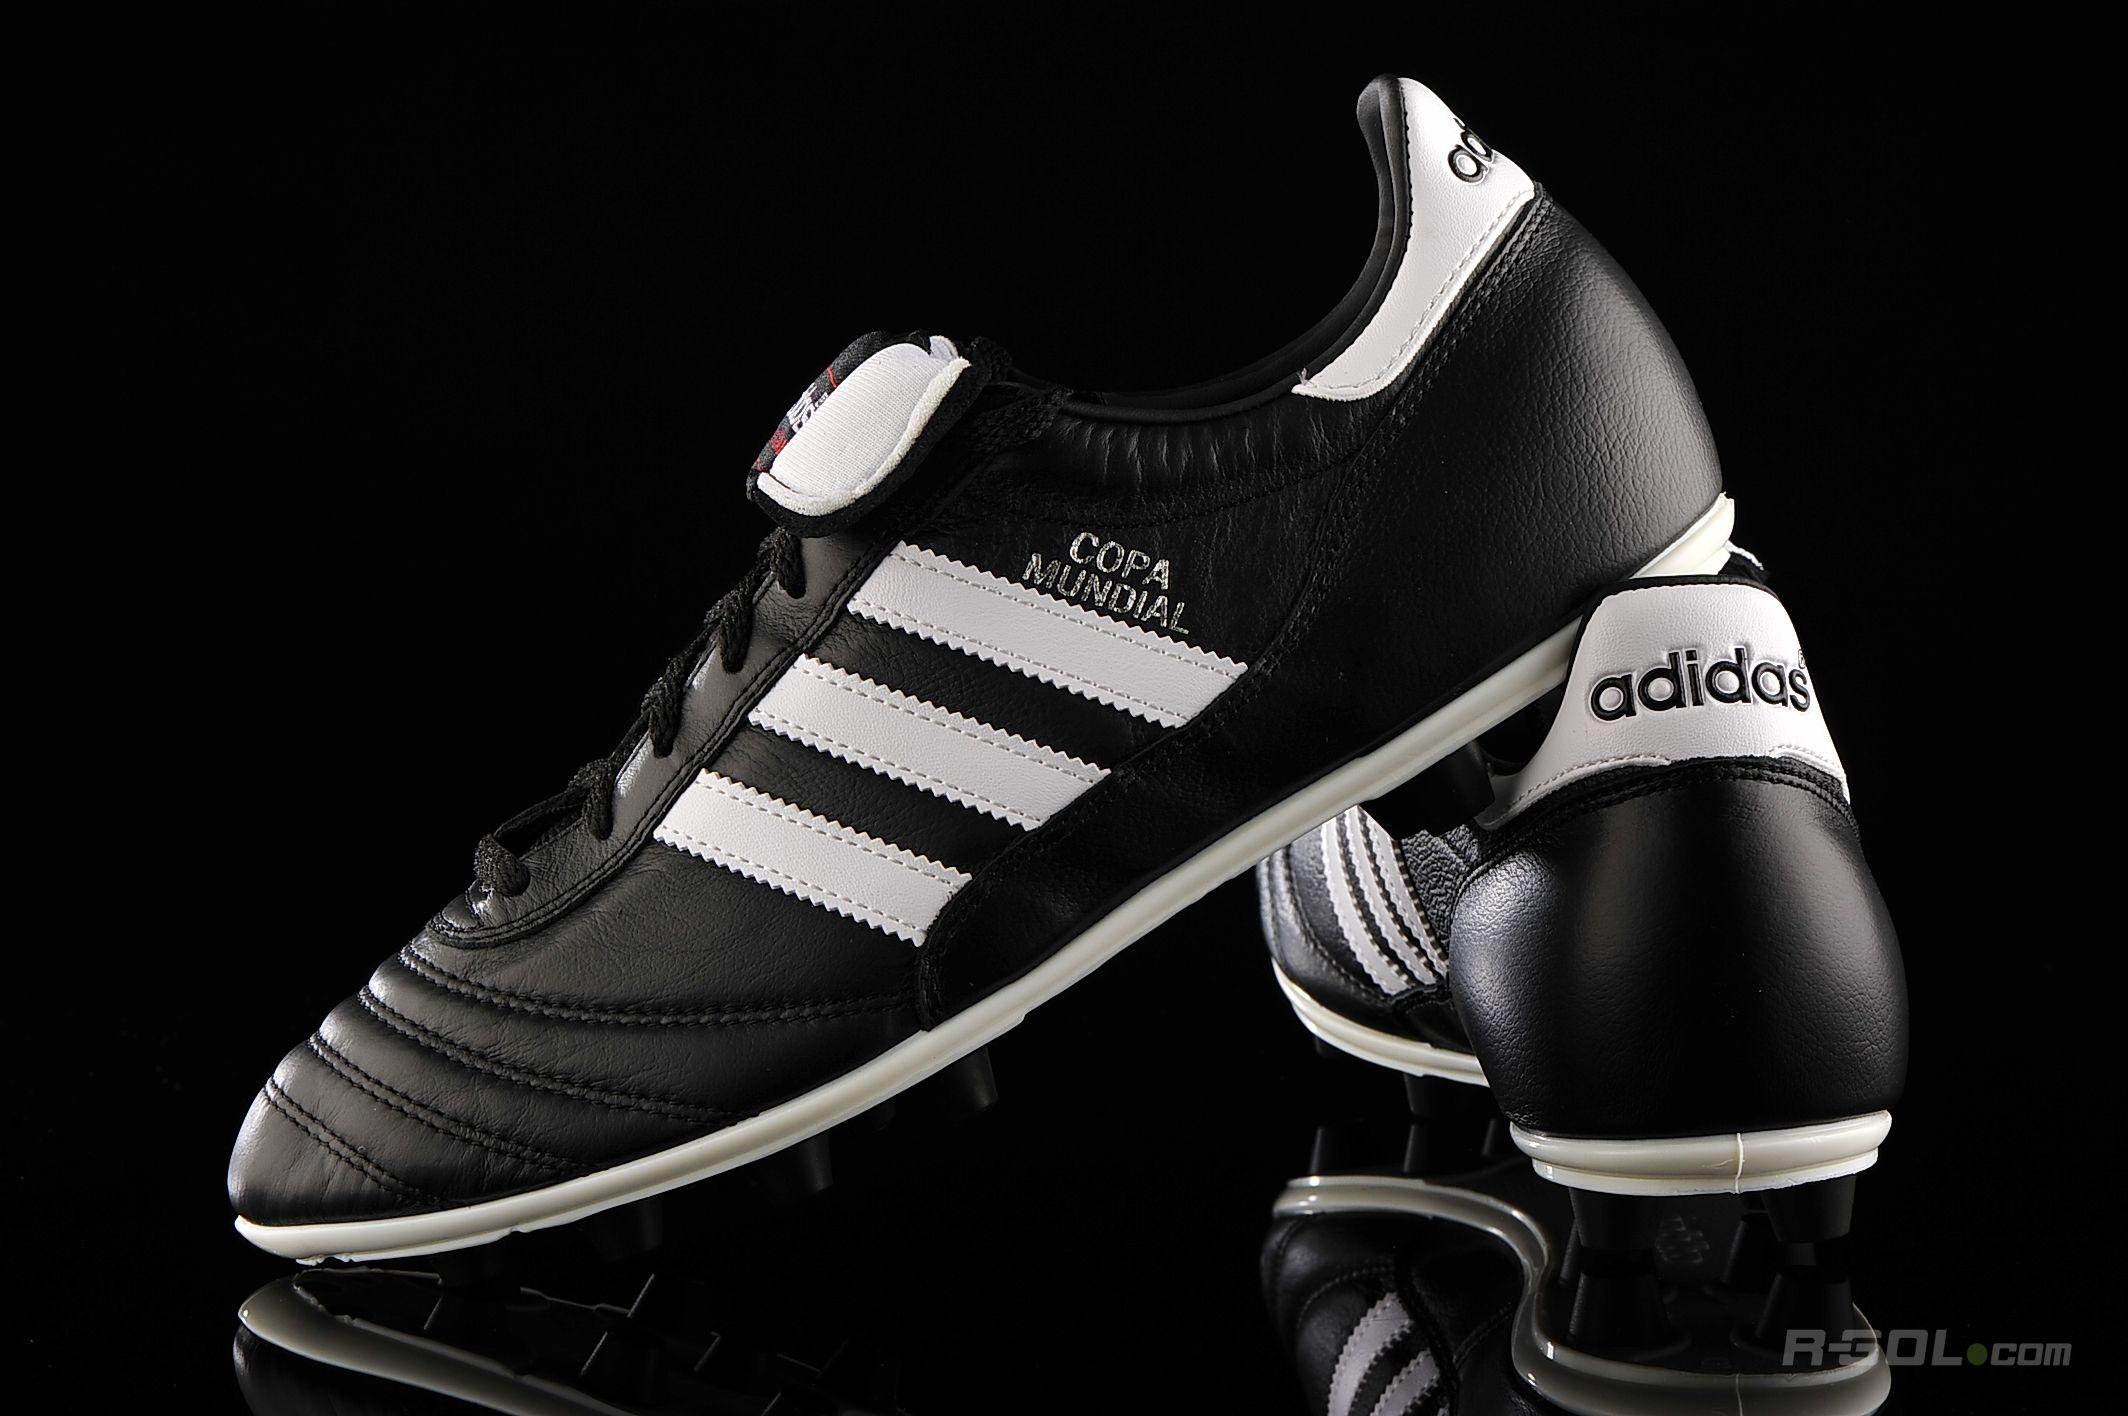 copa mundial kreedon best football shoes